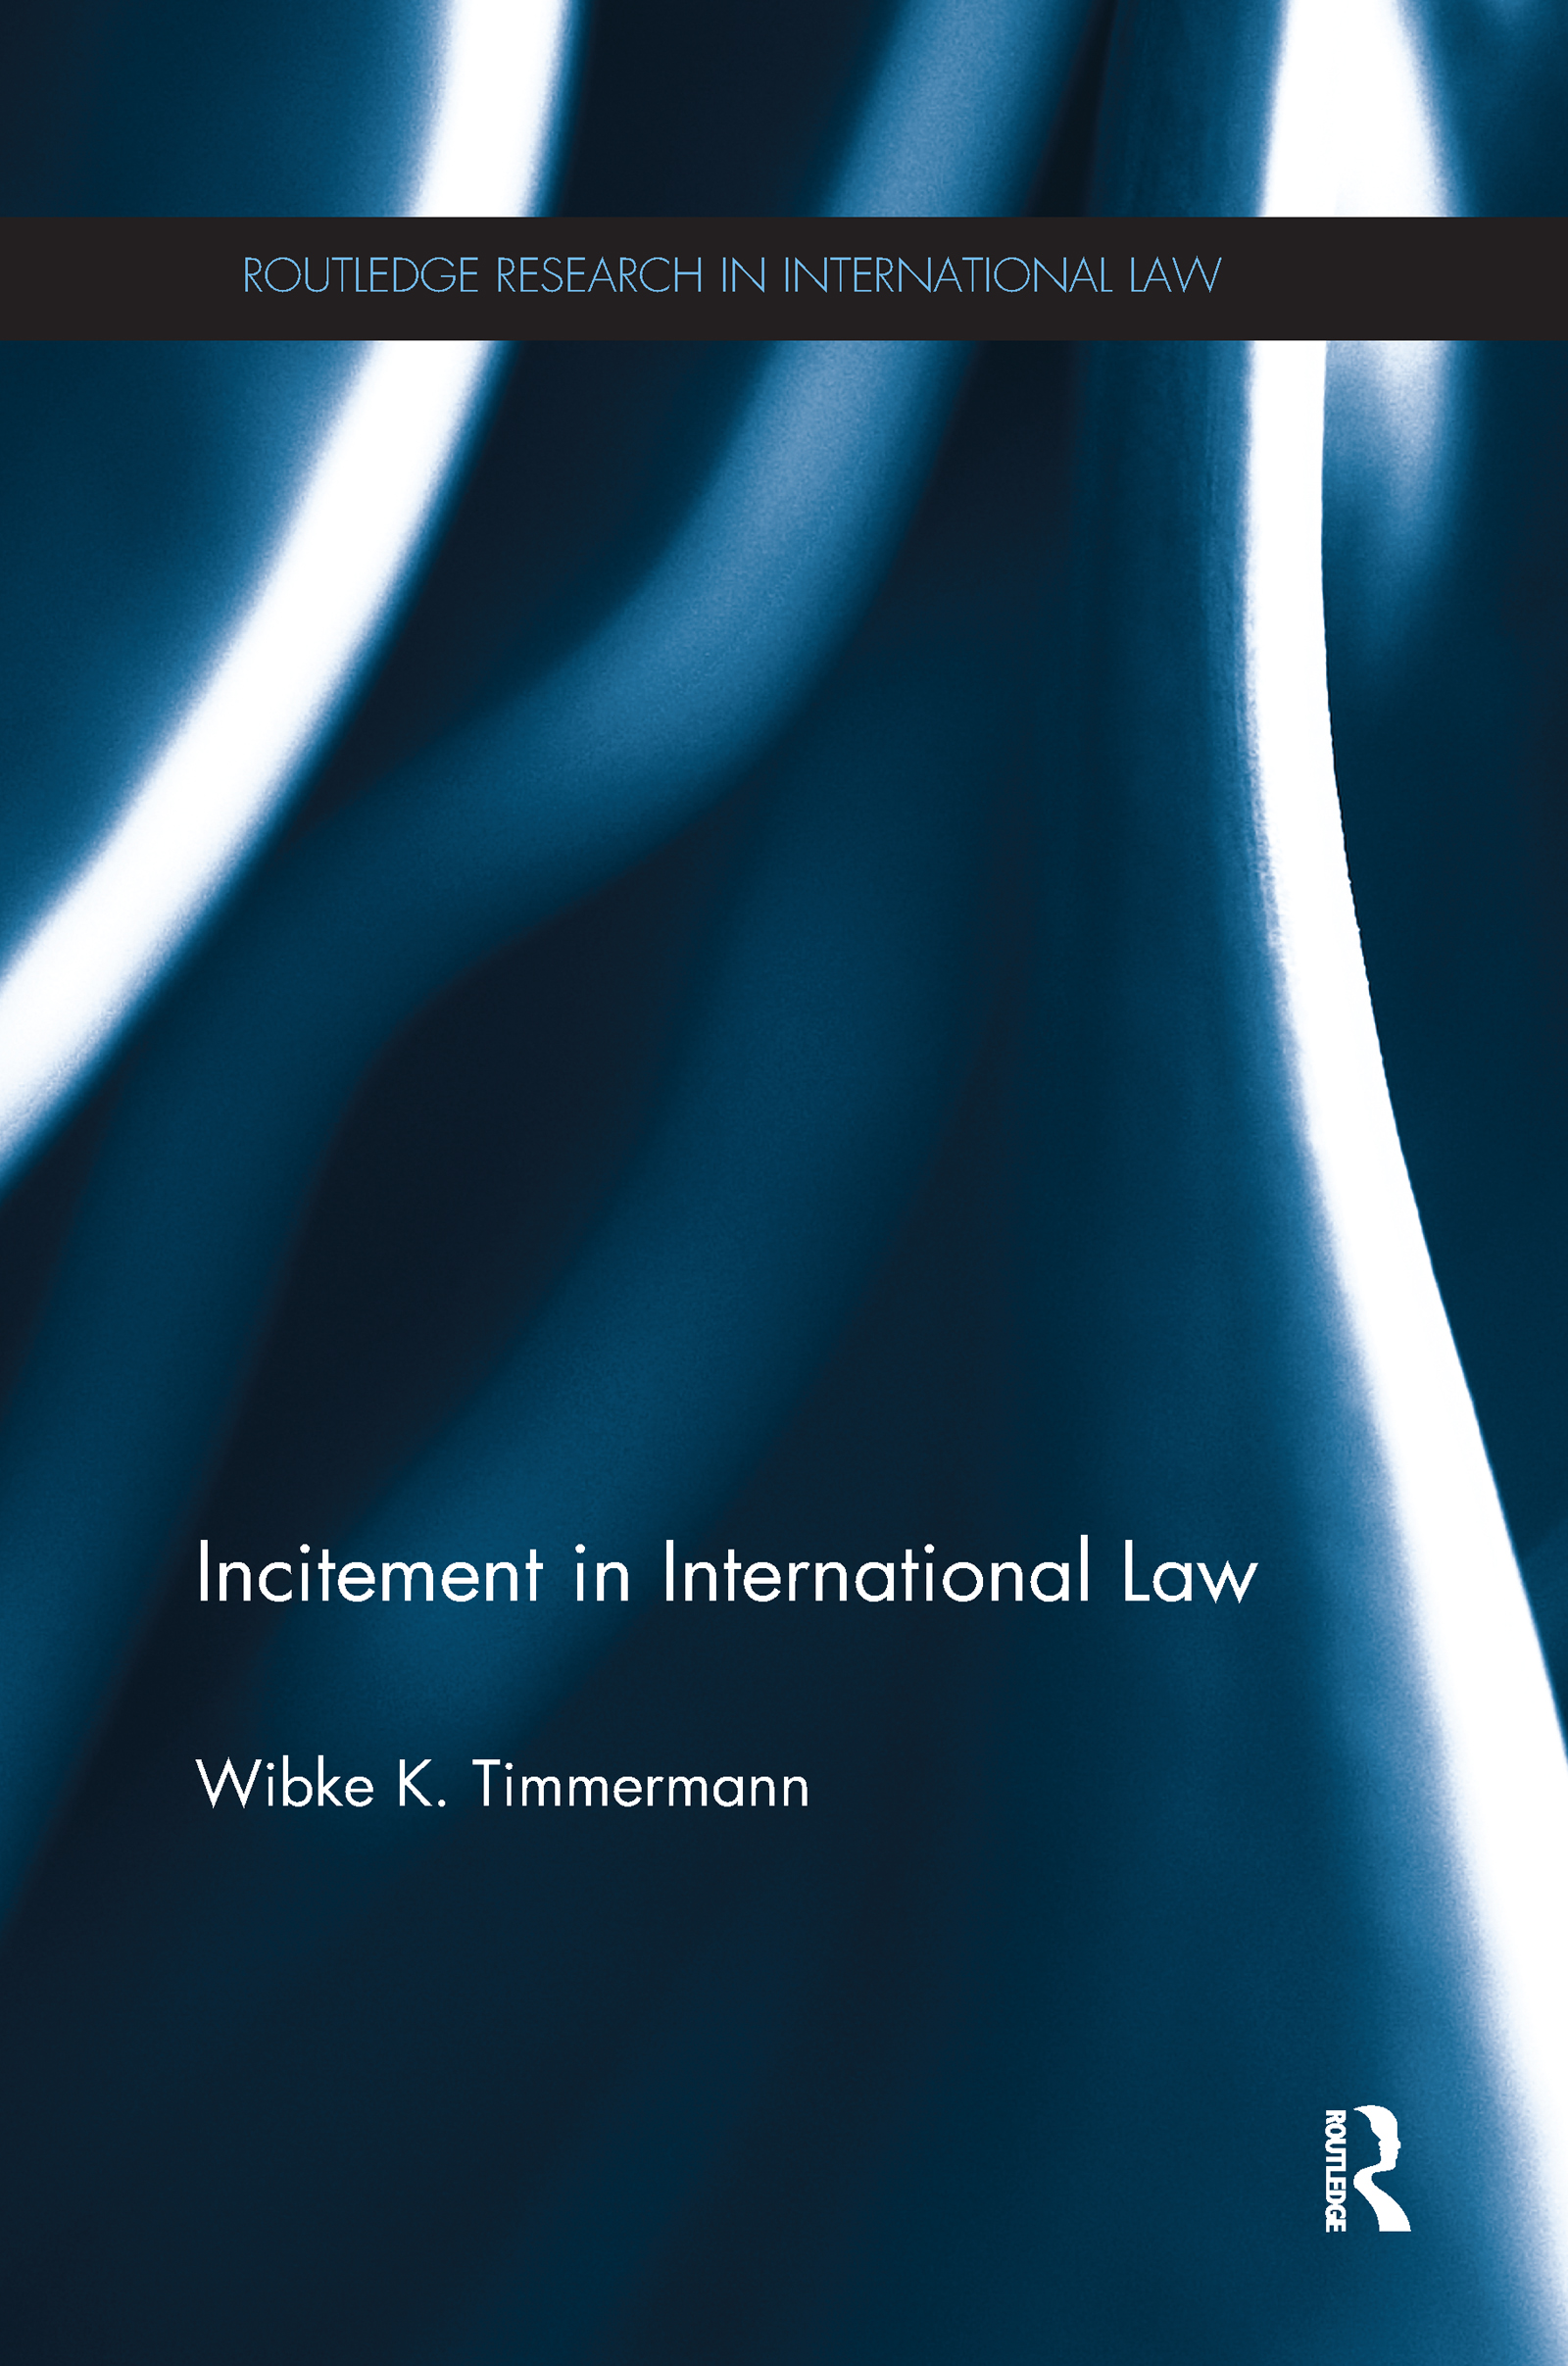 Incitement in International Law